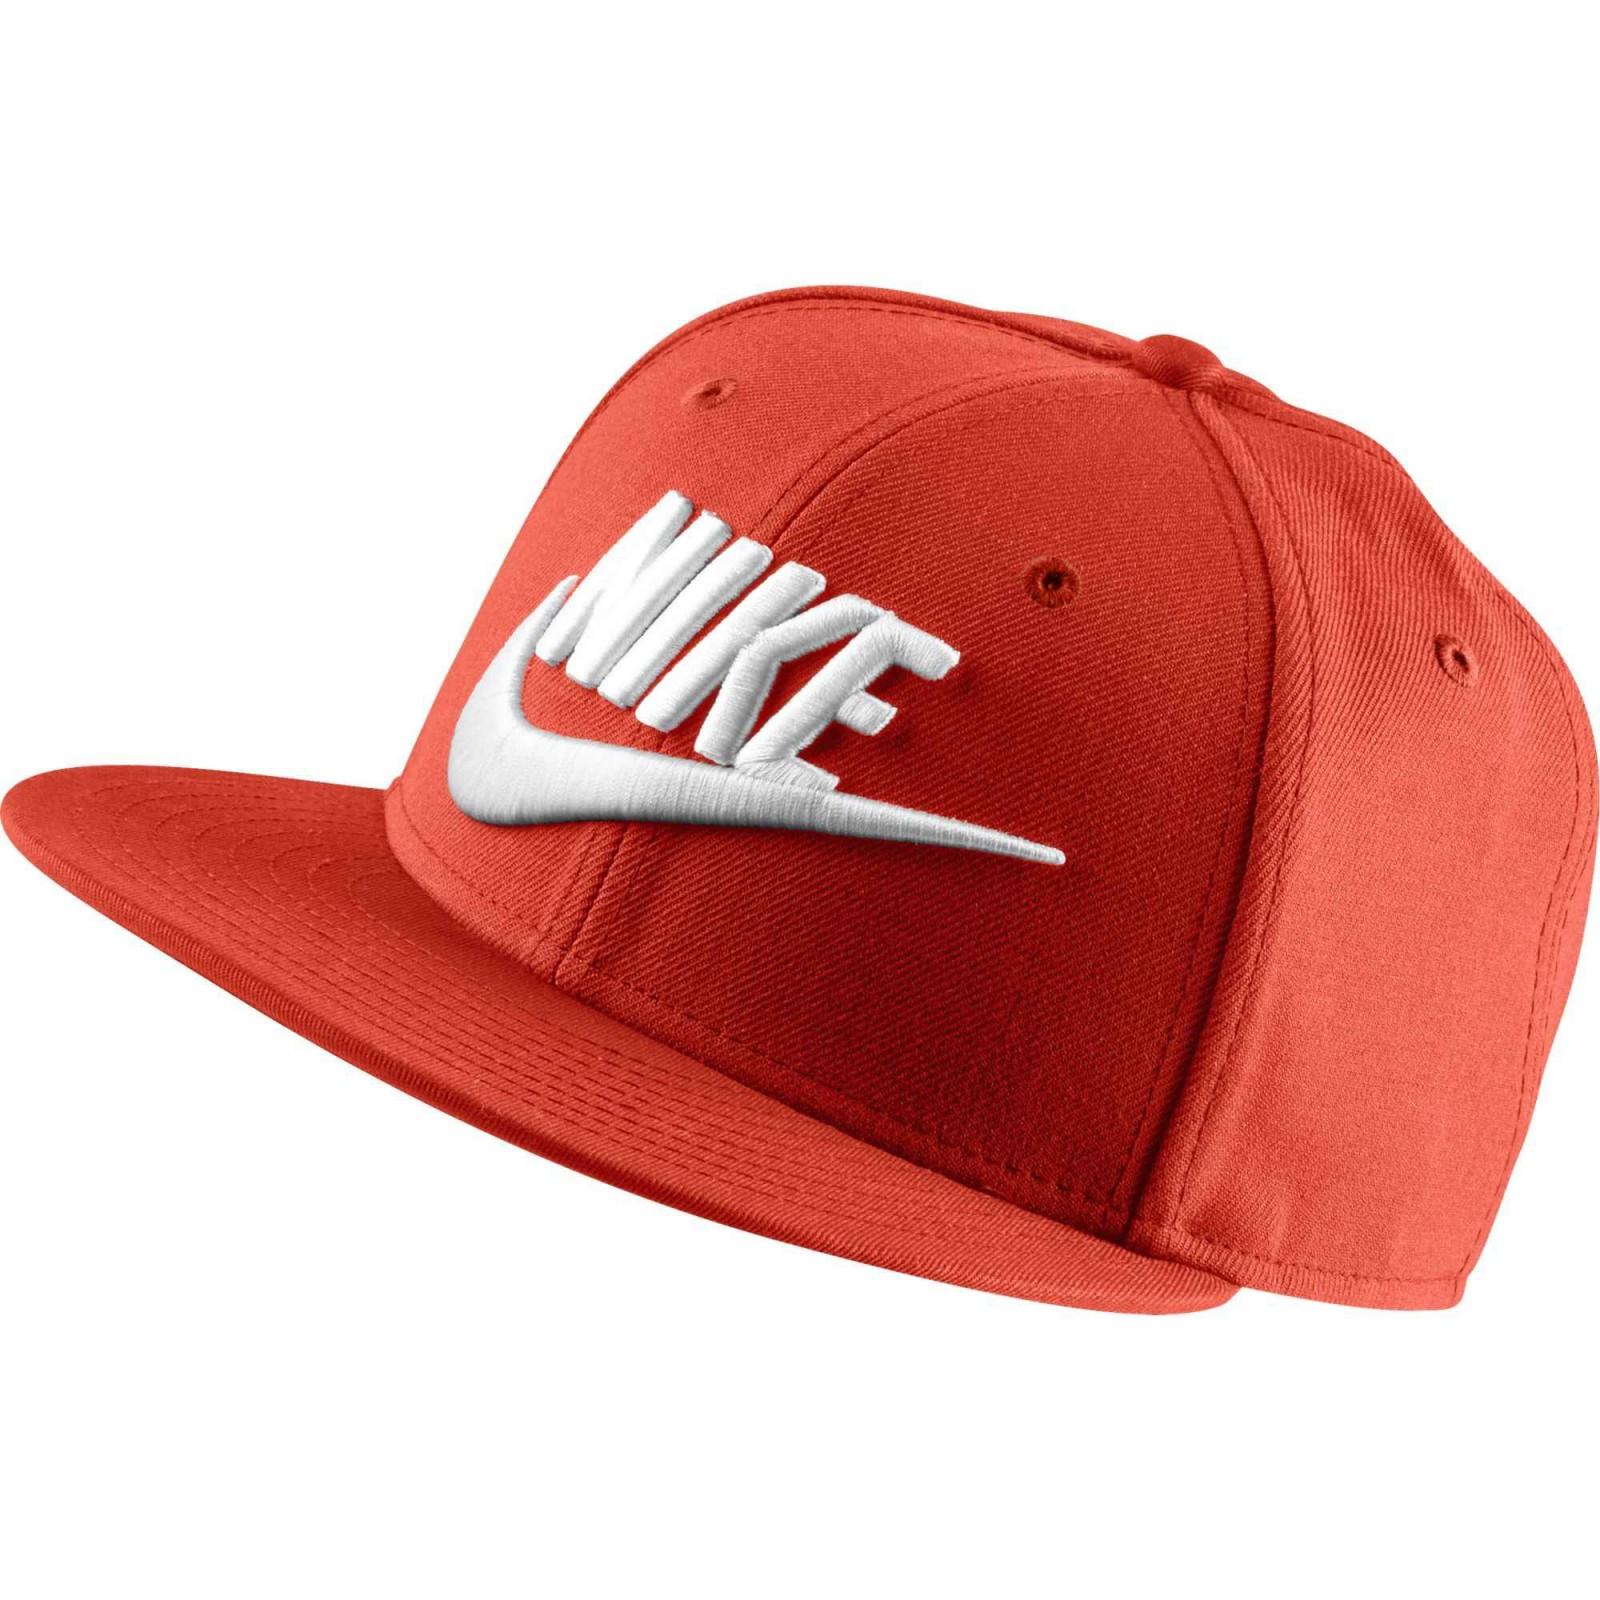 ca0756eaebc Kšiltovka Nike FUTURA TRUE-RED